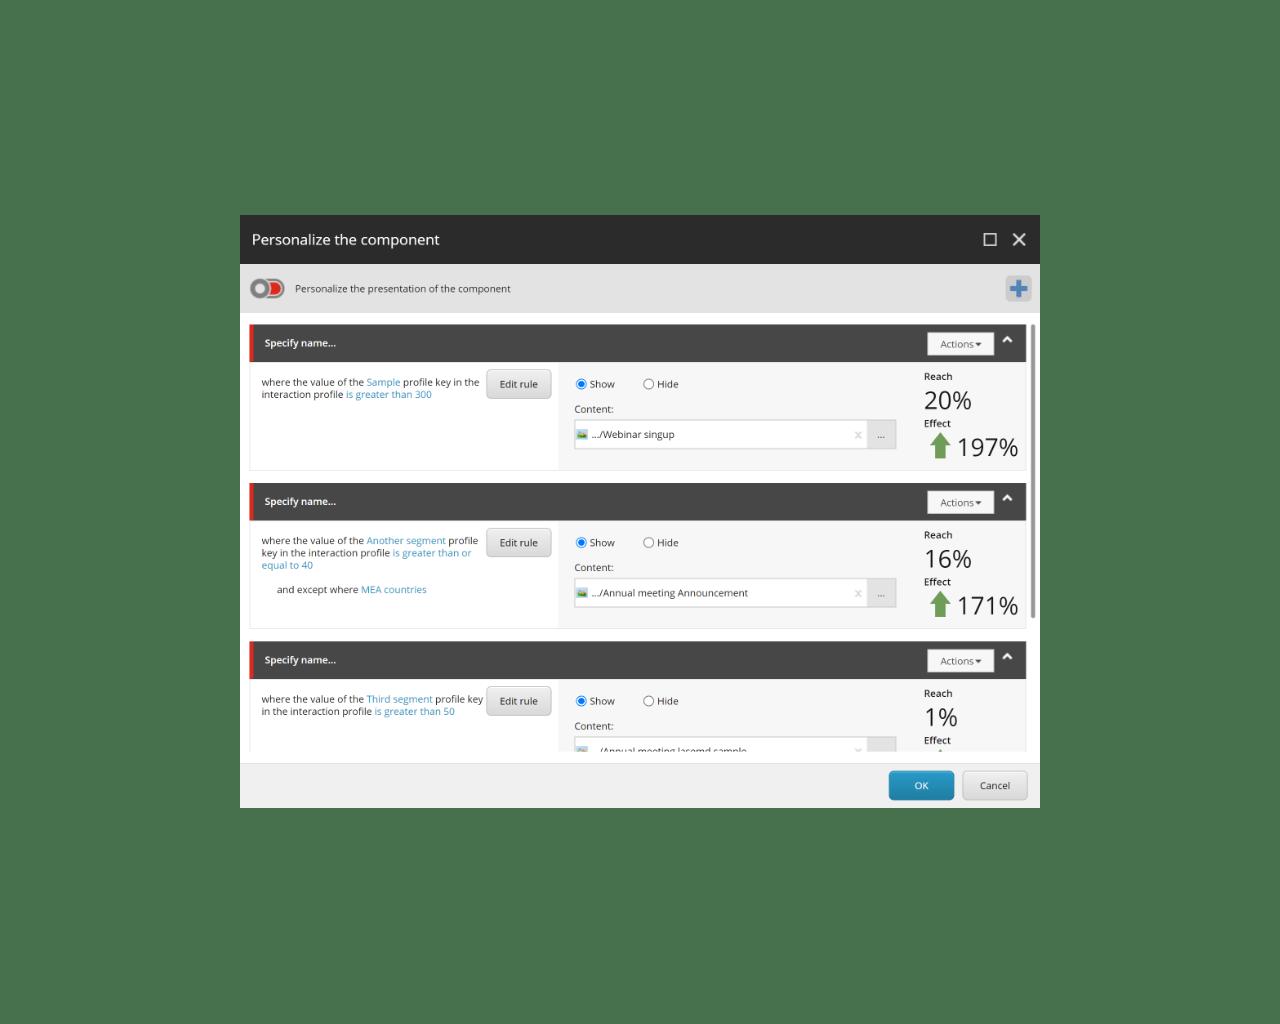 Sitecore panel-Personalize the component